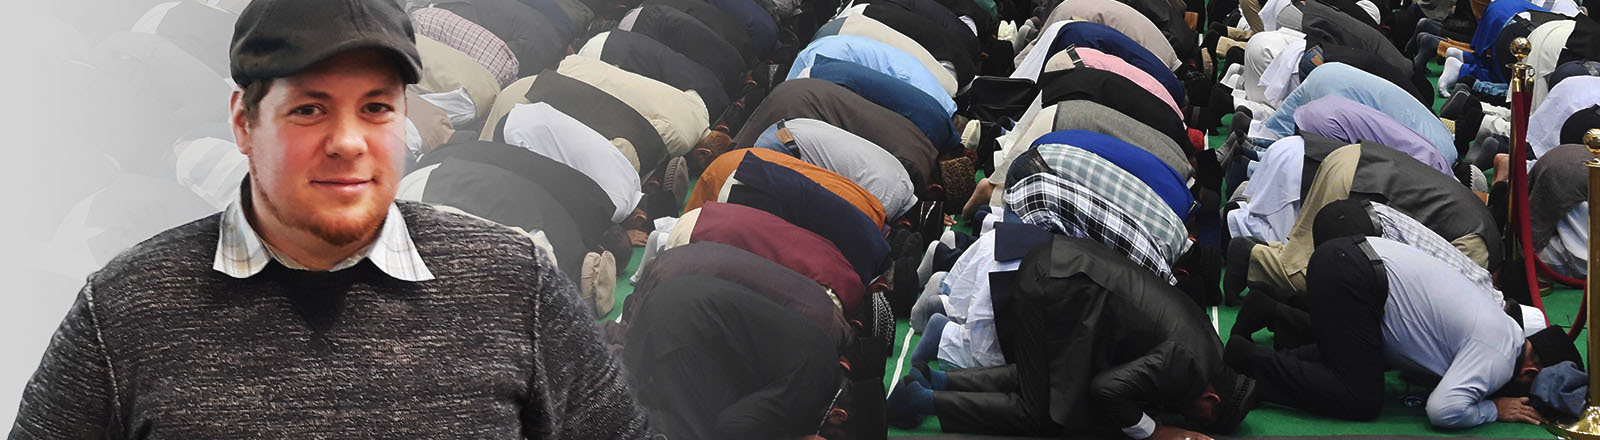 Collage: Porträt Volker Ahmad Qasir | Betende Muslime